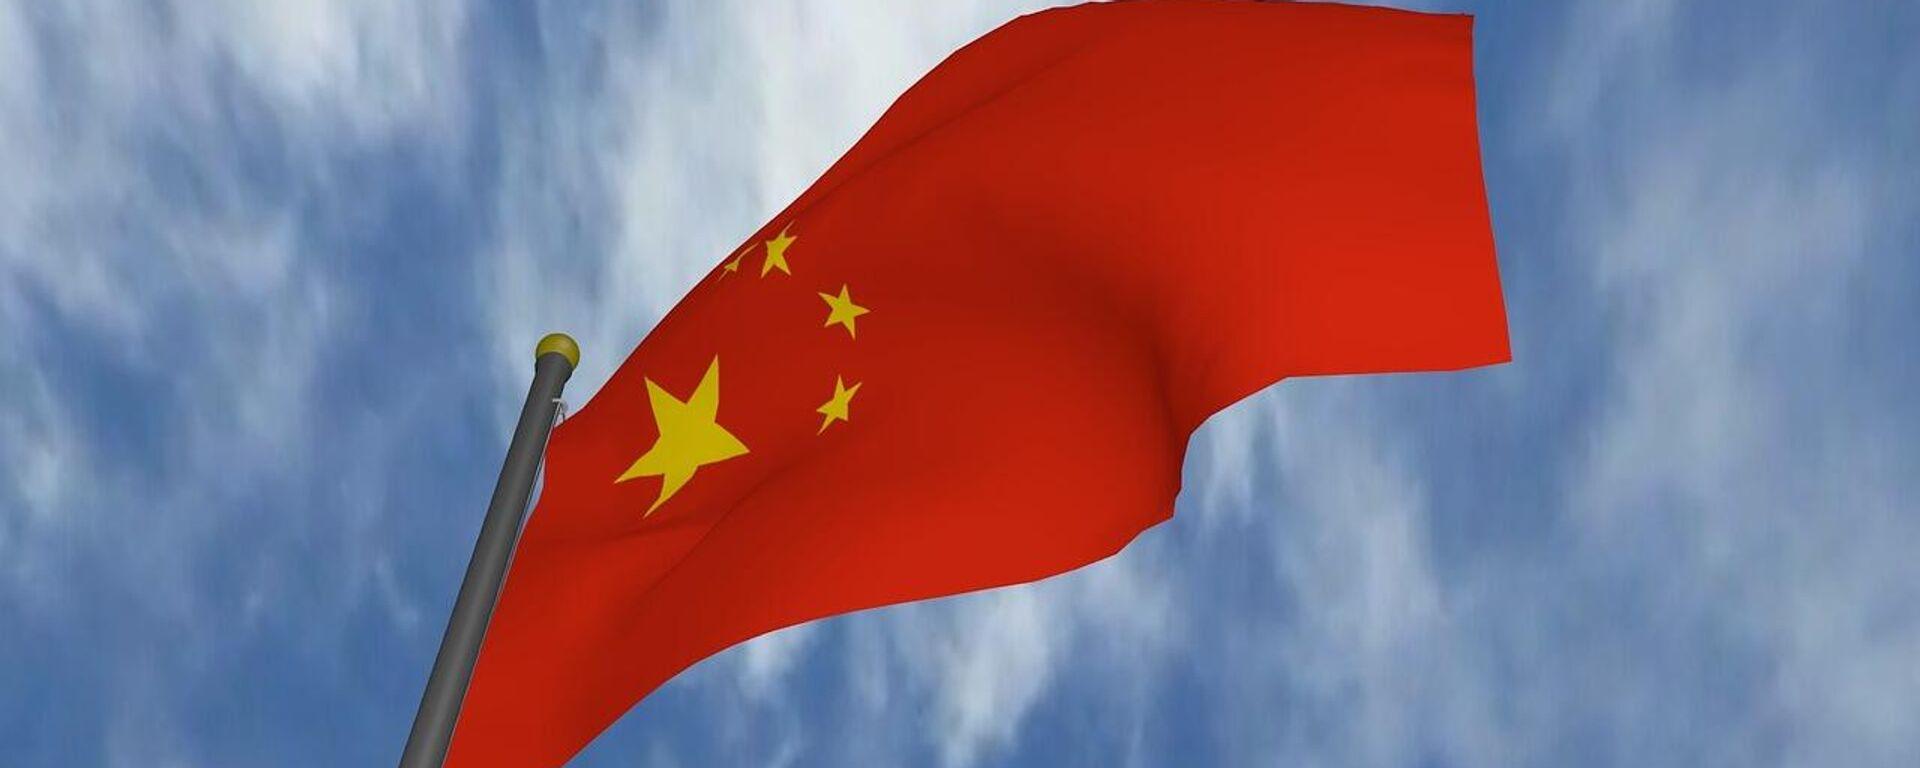 Bandera china - Sputnik Mundo, 1920, 08.09.2021